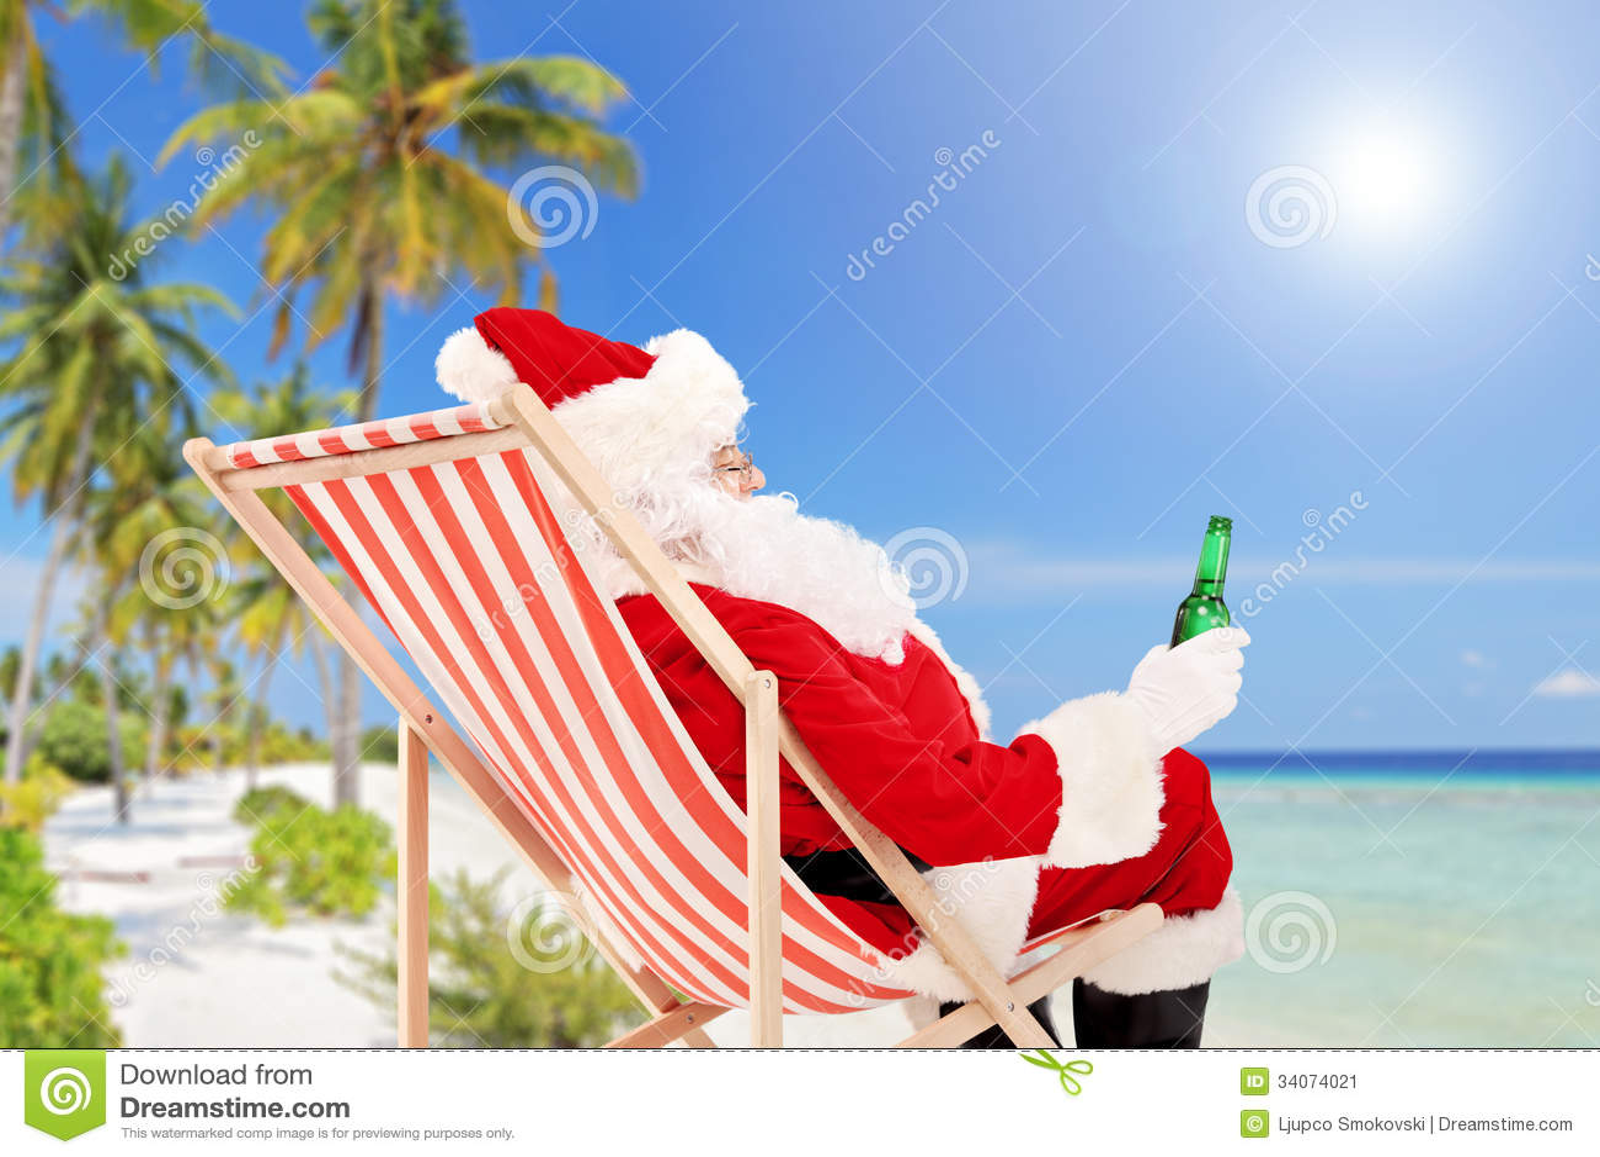 free clipart santa on the beach - photo #36